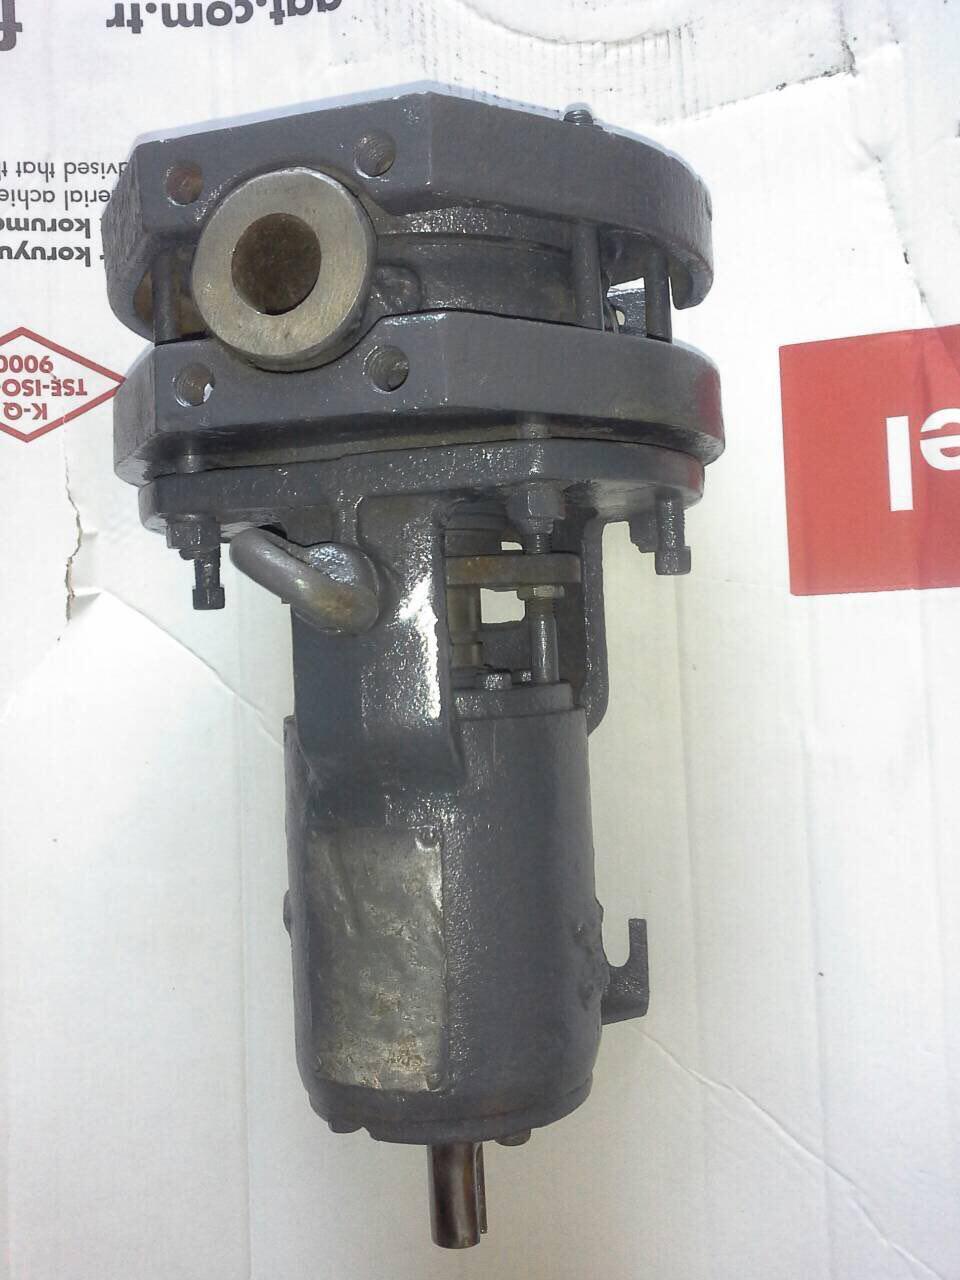 Насос Х50-32-125К-СД (Х 50-32-125К-СД). Цена с НДС.